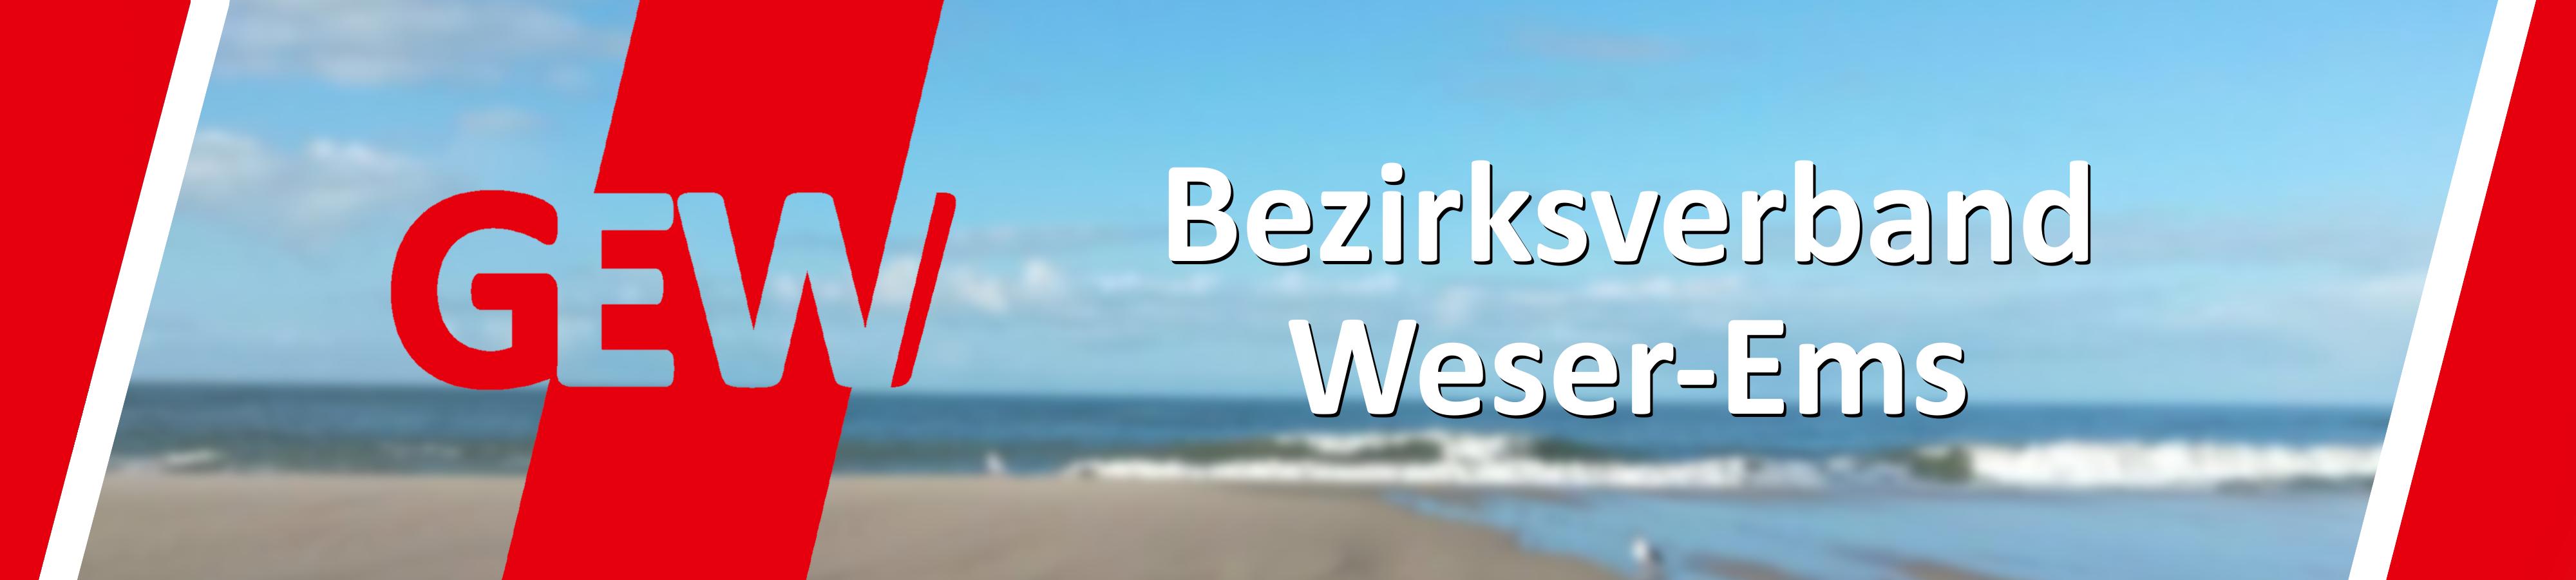 GEW Bezirksverband Weser-Ems